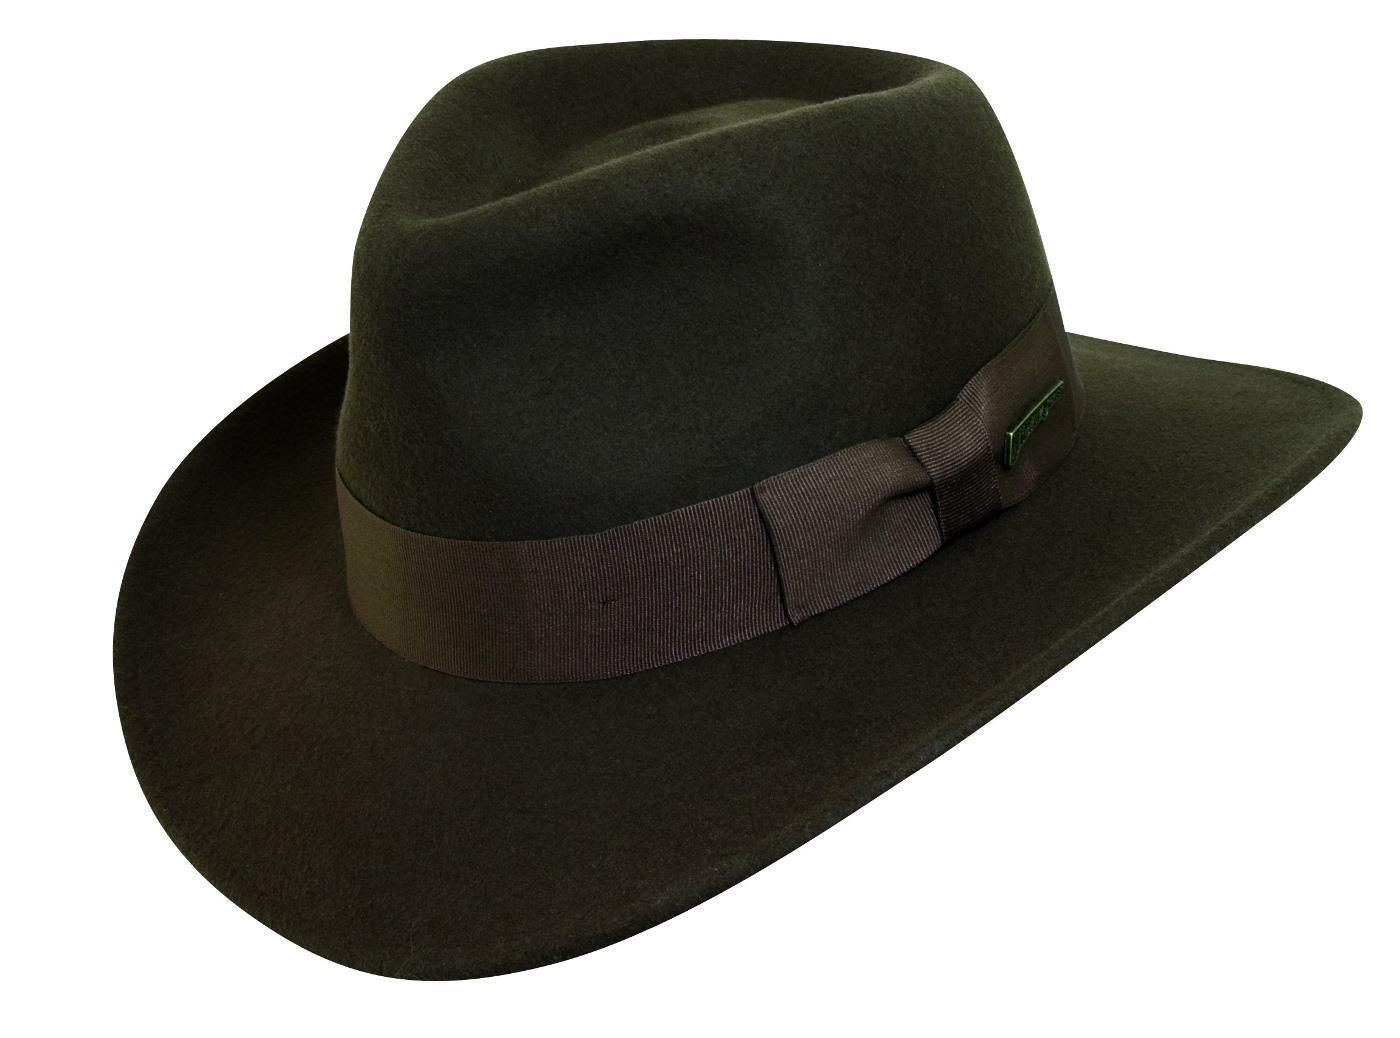 db91e68413f New Dorfman Pacific Men s Indiana Jones Wool Felt Crushable Outback ...